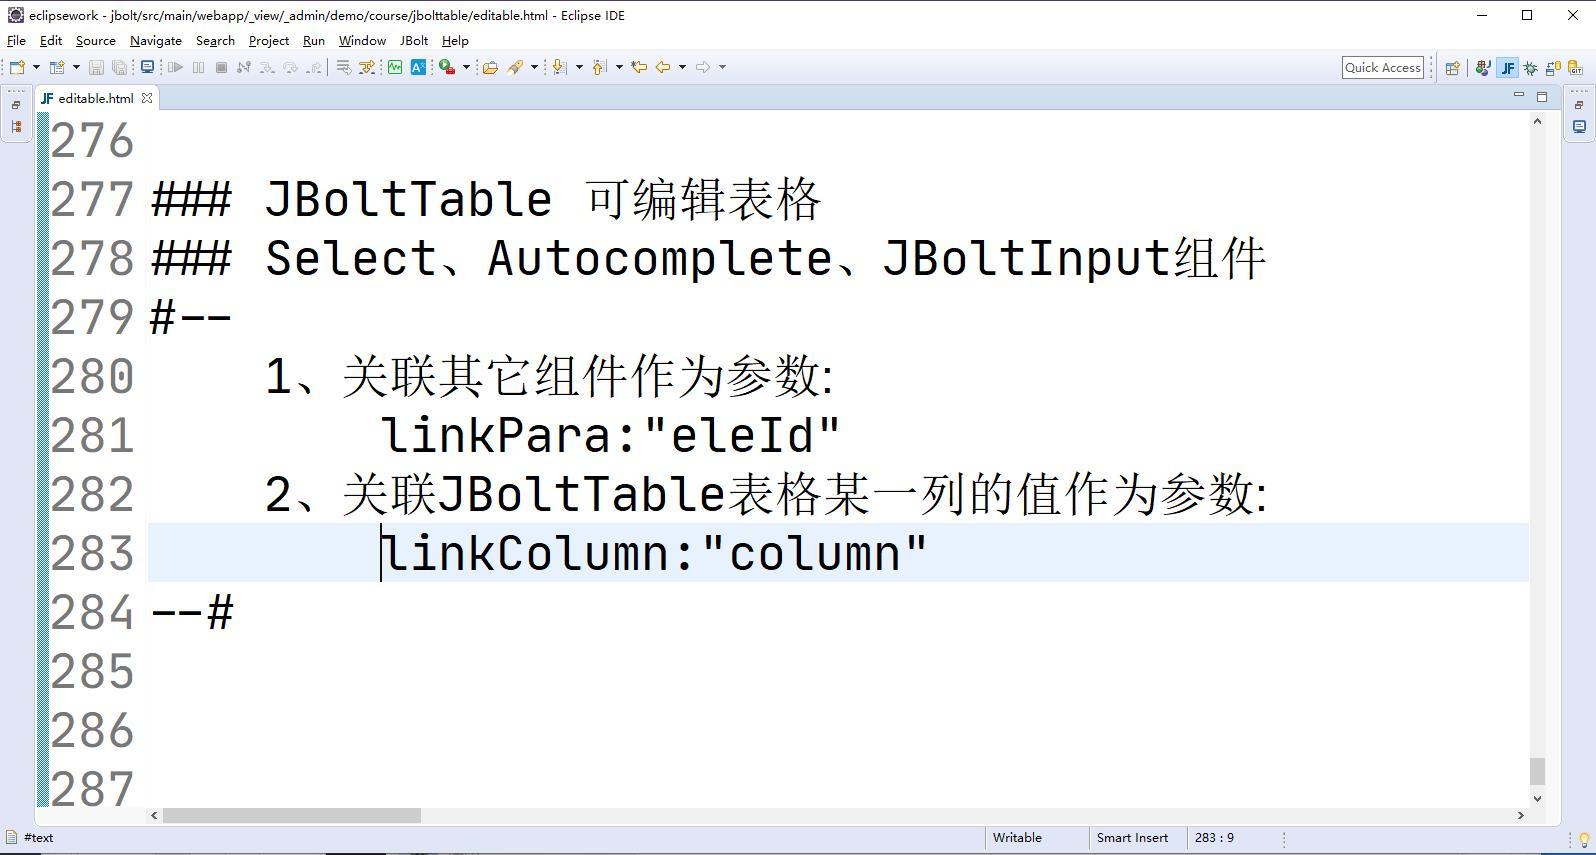 jbolttable-可编辑表格-linkPara和linkColumn